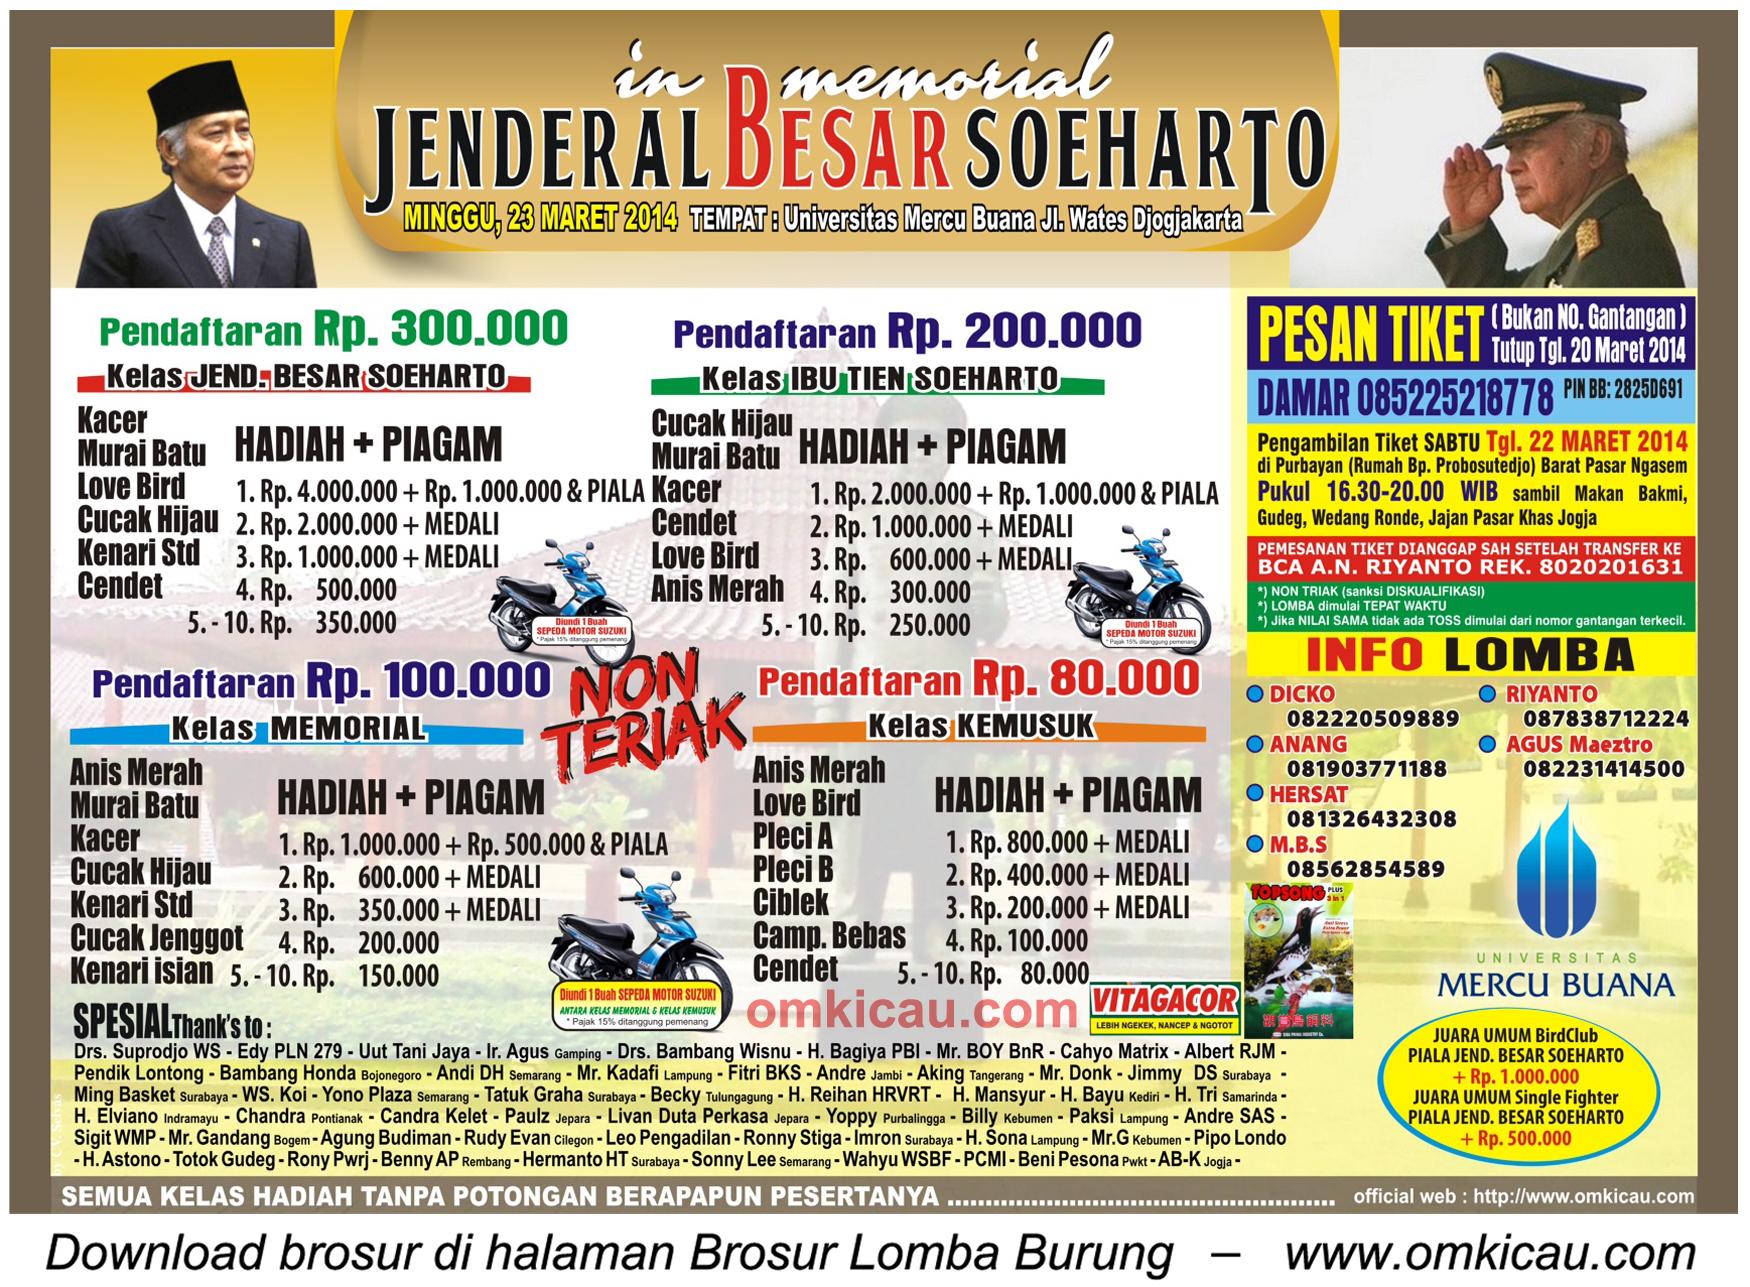 Brosur Lomba Burung Jenderal Besar Soeharto